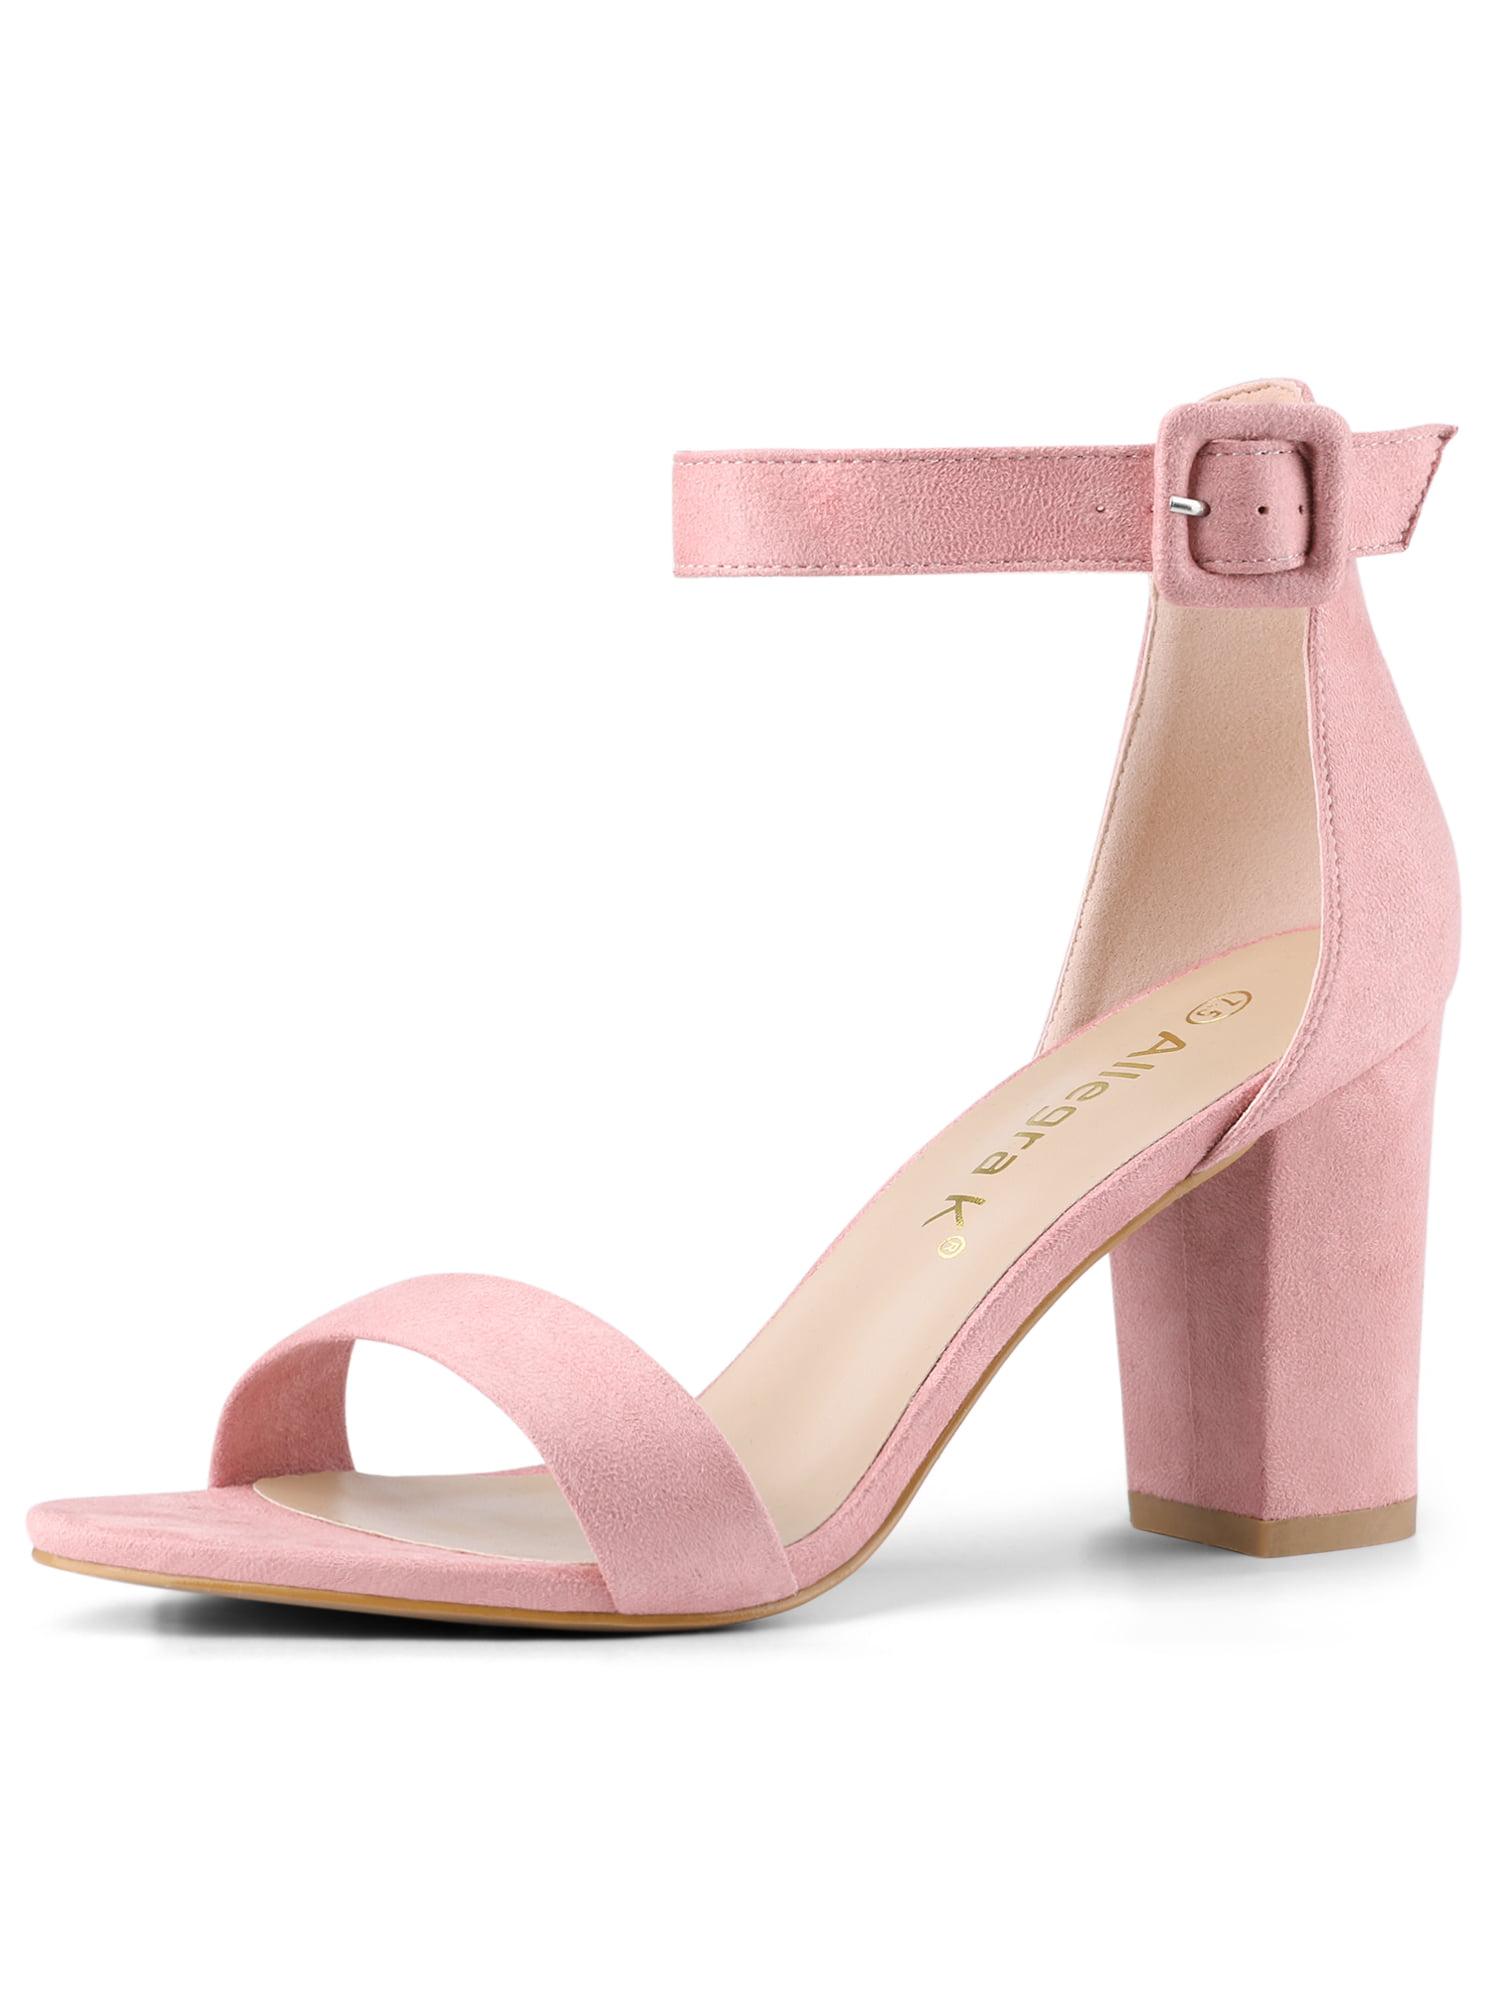 284H Woman Open Toe Chunky High Heel